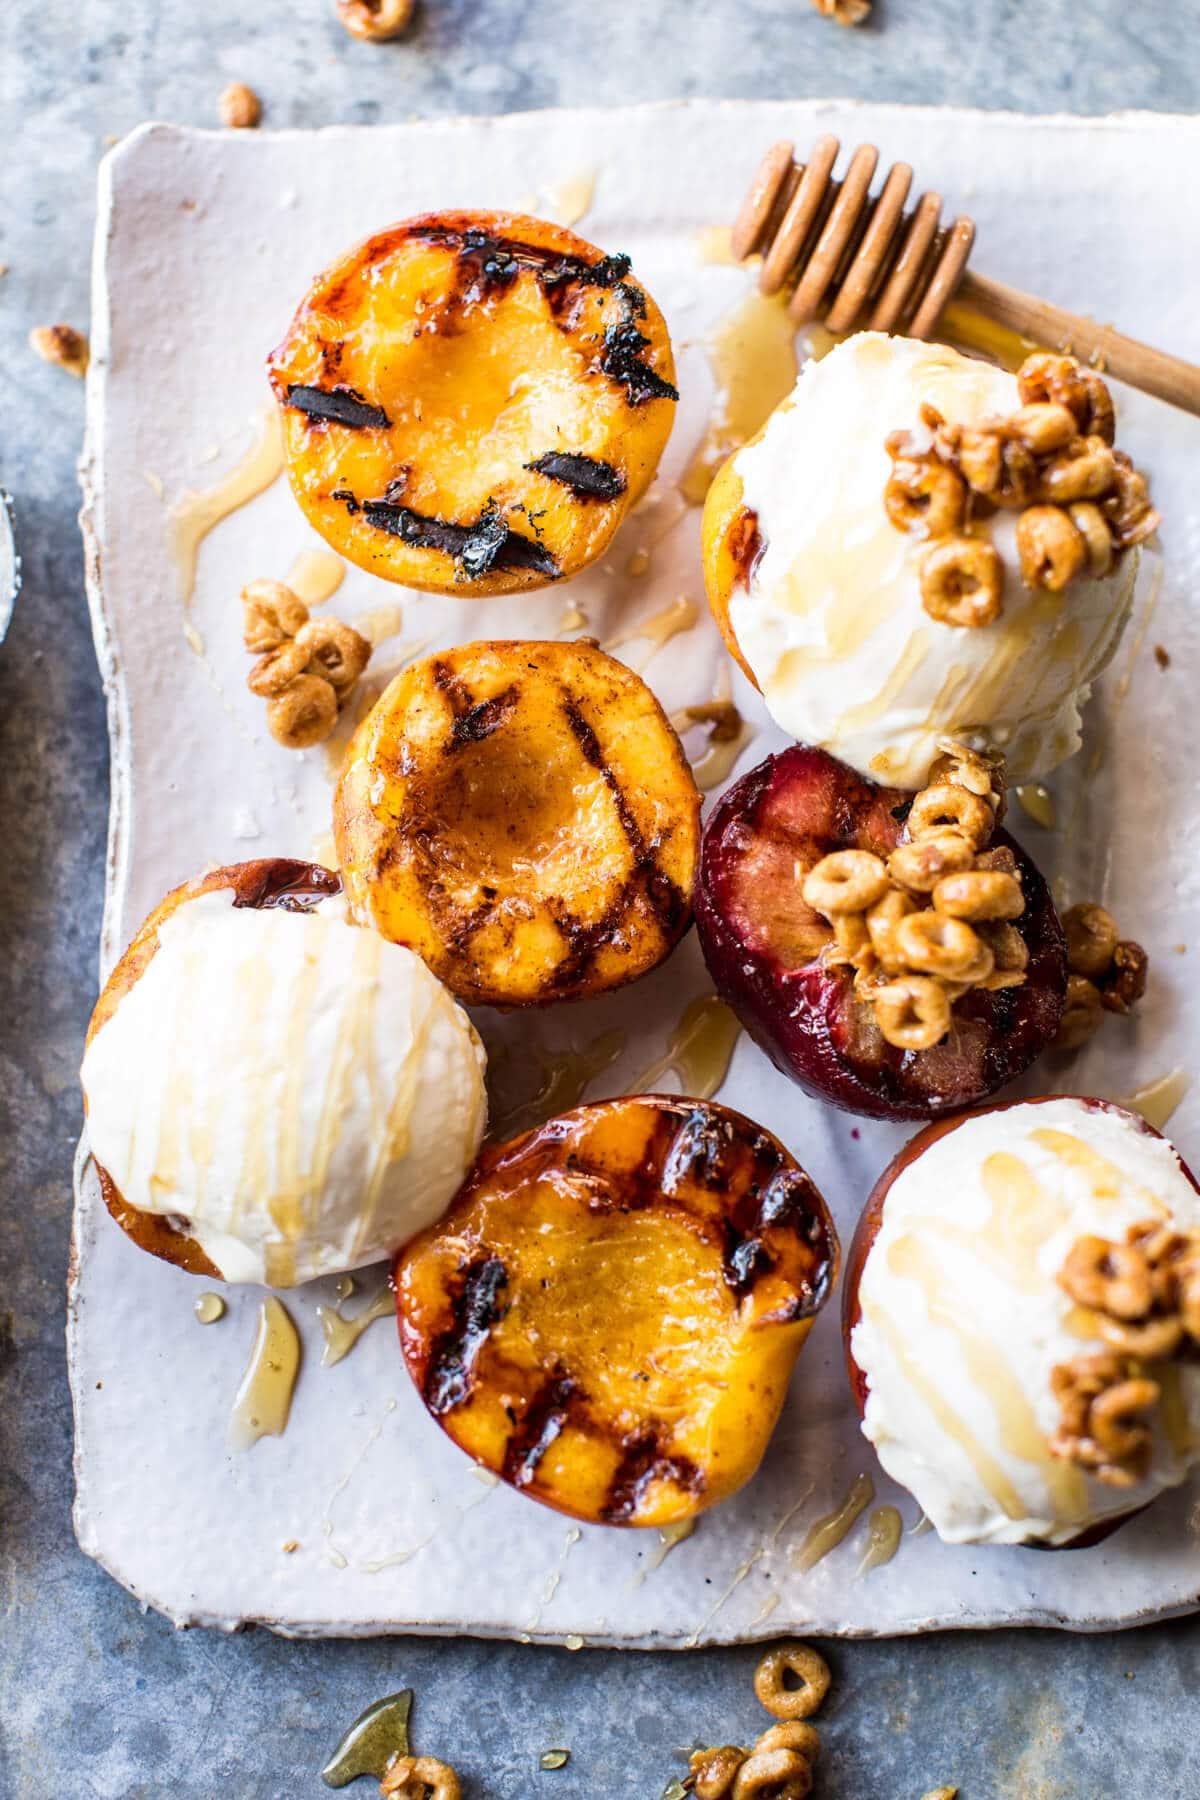 17.Cinnamon Grilled Peaches with Mascarpone Ice Cream